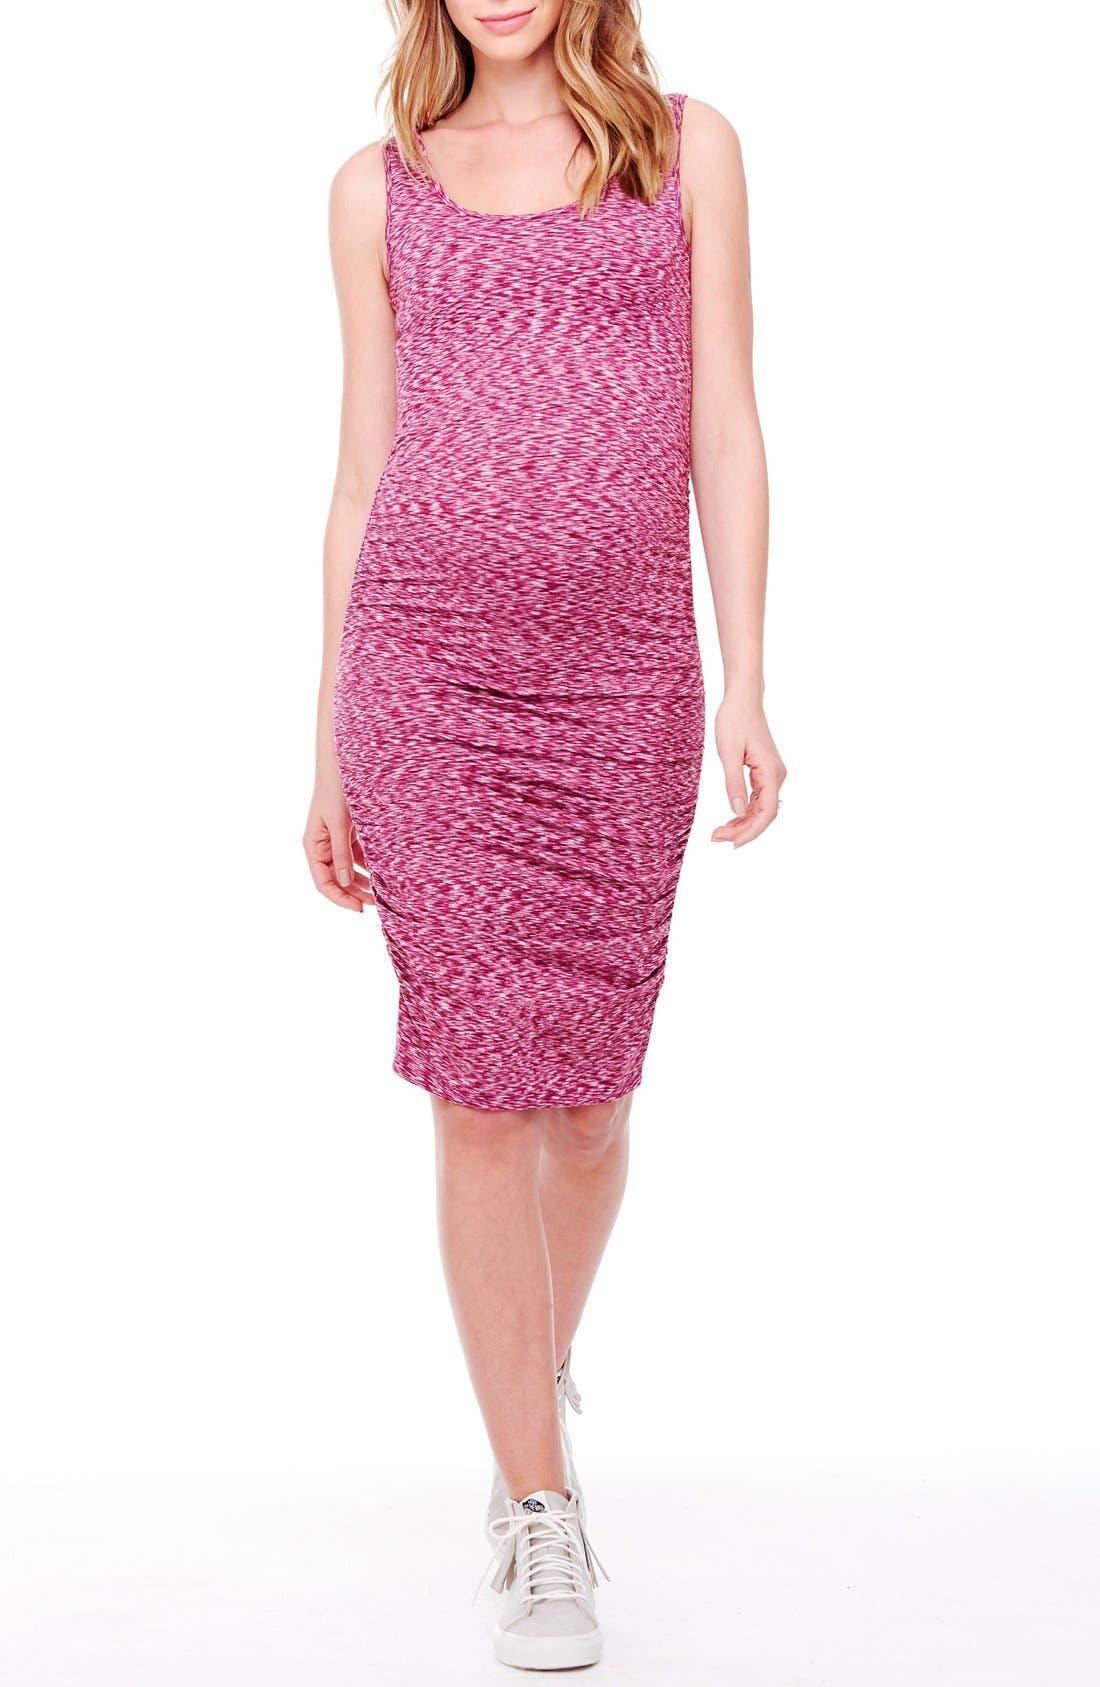 Ingrid & Isabel Space Dye Ruched Maternity Tank Dress